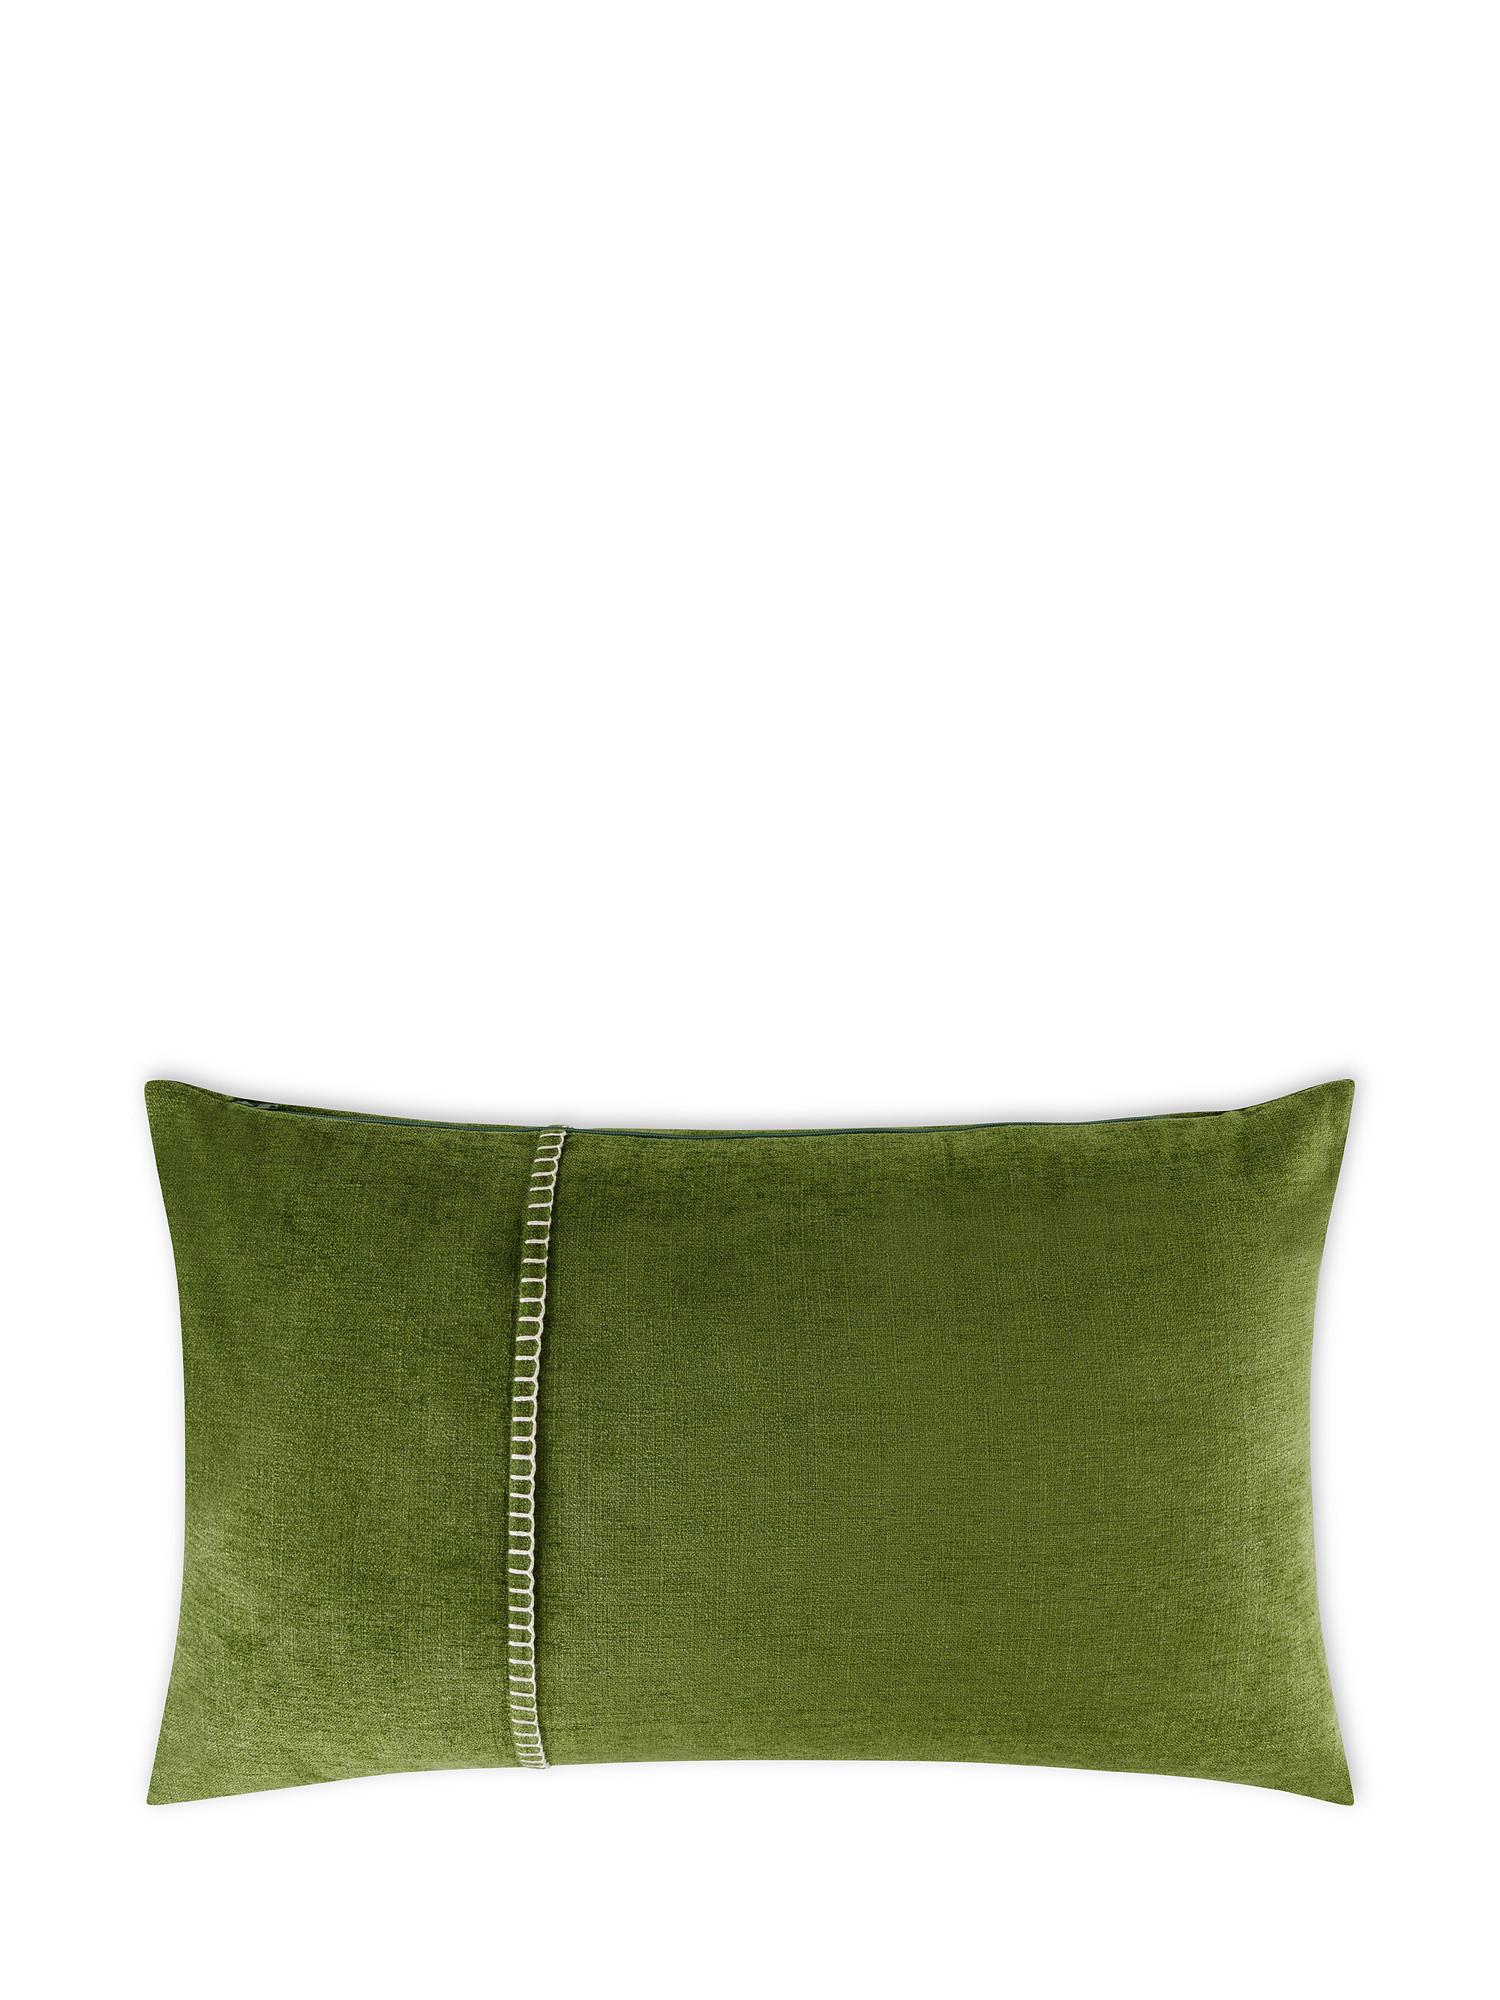 Cuscino velluto con ricamo 35x55cm, Multicolor, large image number 1